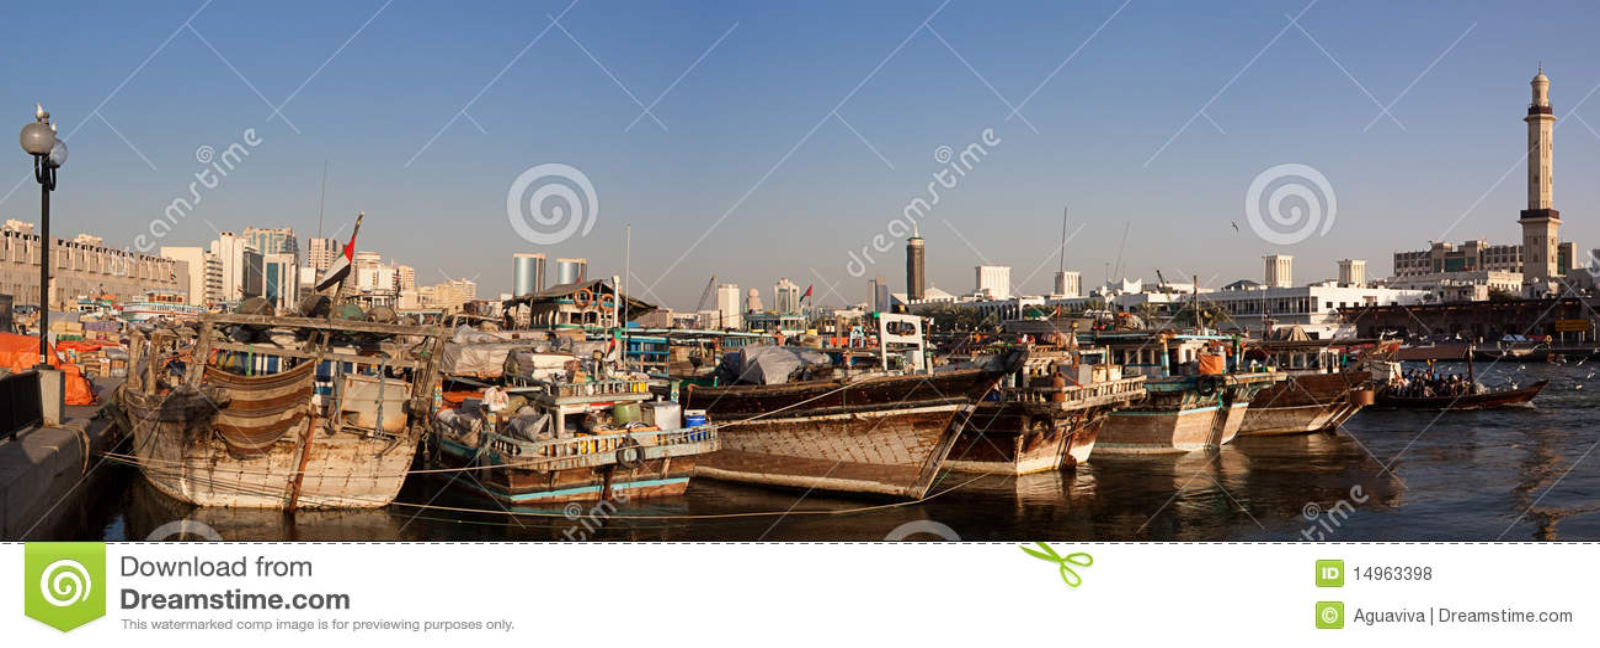 Zatoczka Dubai